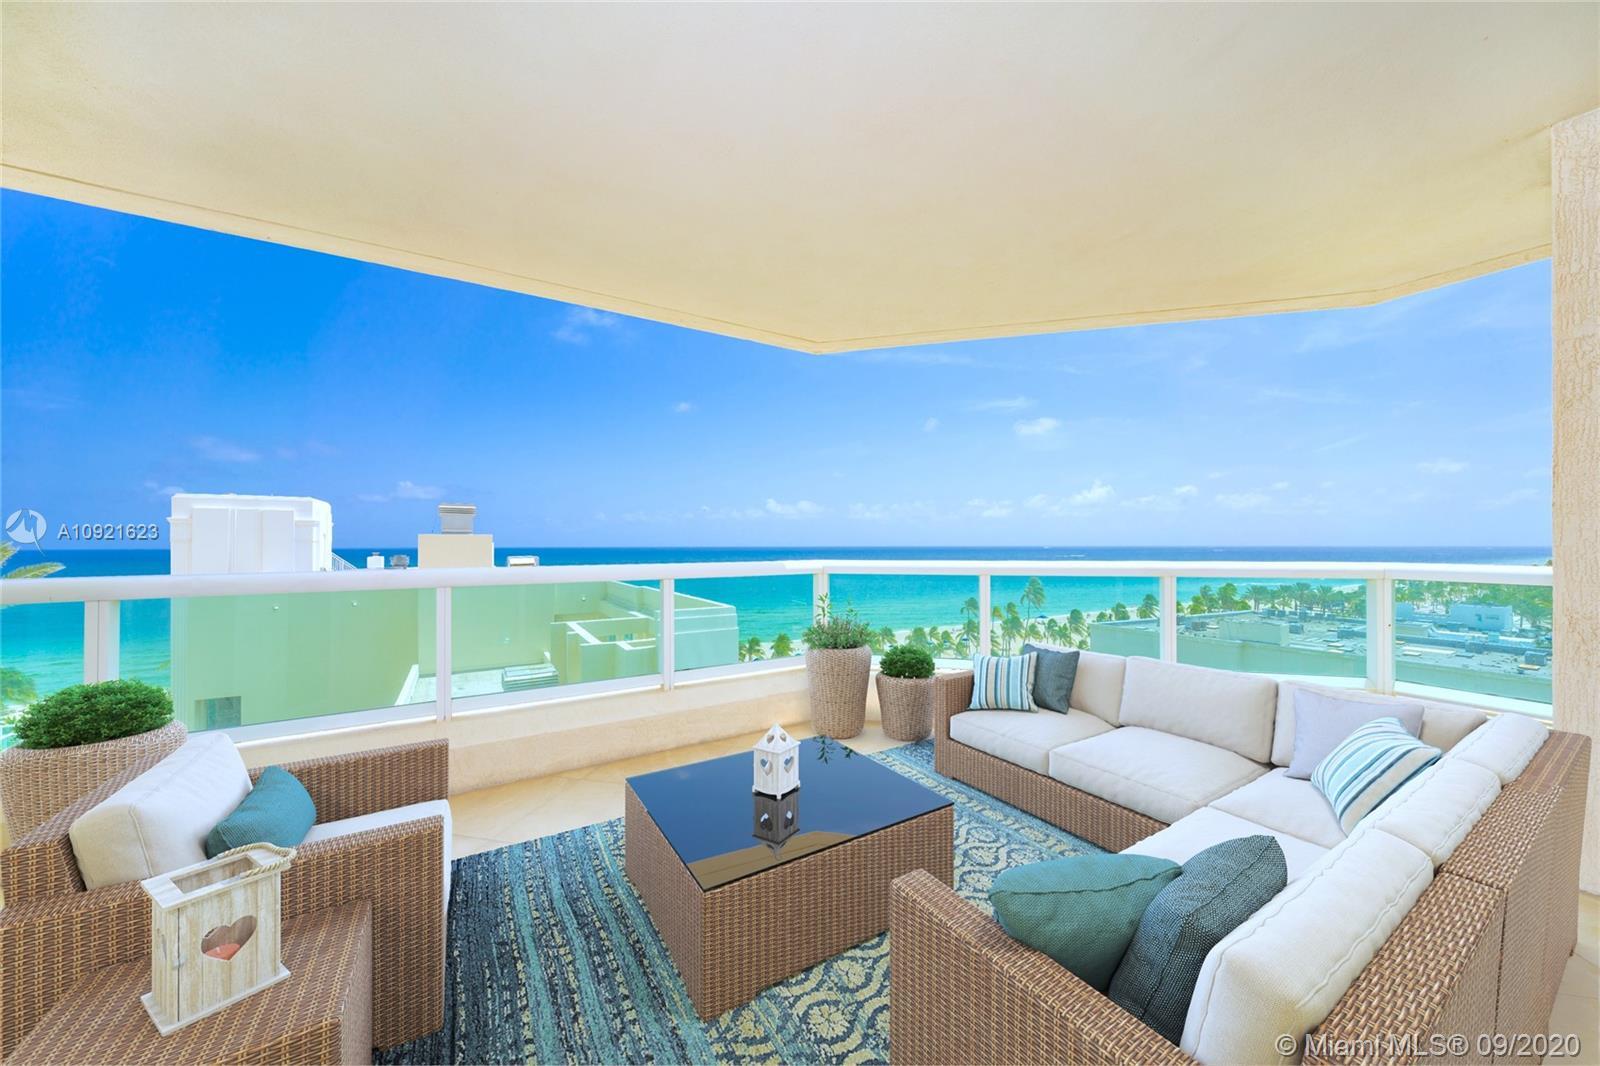 Las Olas Beach Club #901 - 101 S Fort Lauderdale Beach Blvd #901, Fort Lauderdale, FL 33316